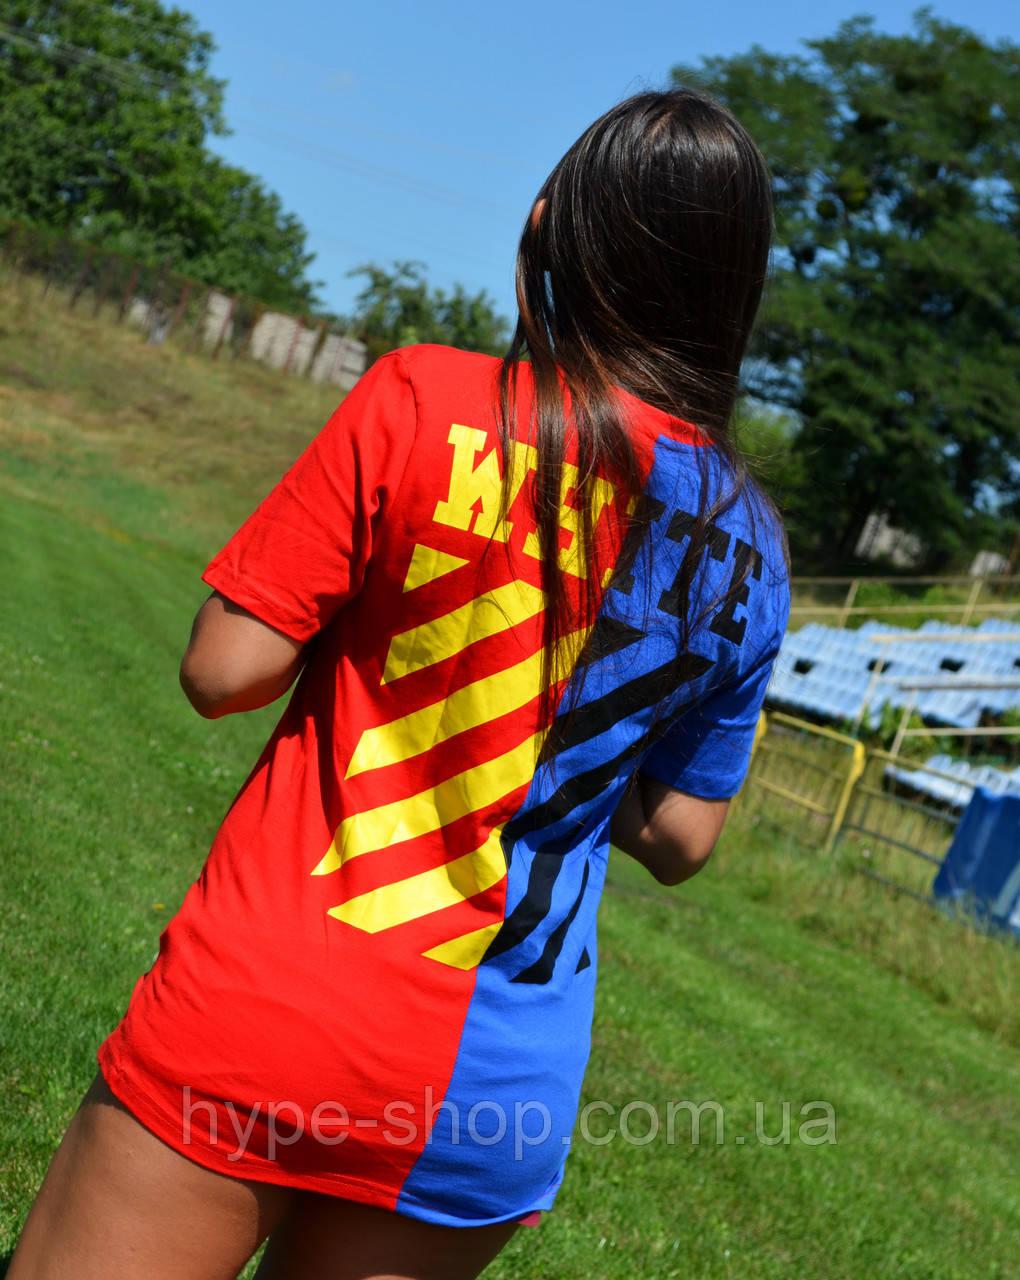 Женская Футболка в стиле Off White | ТОП Качество